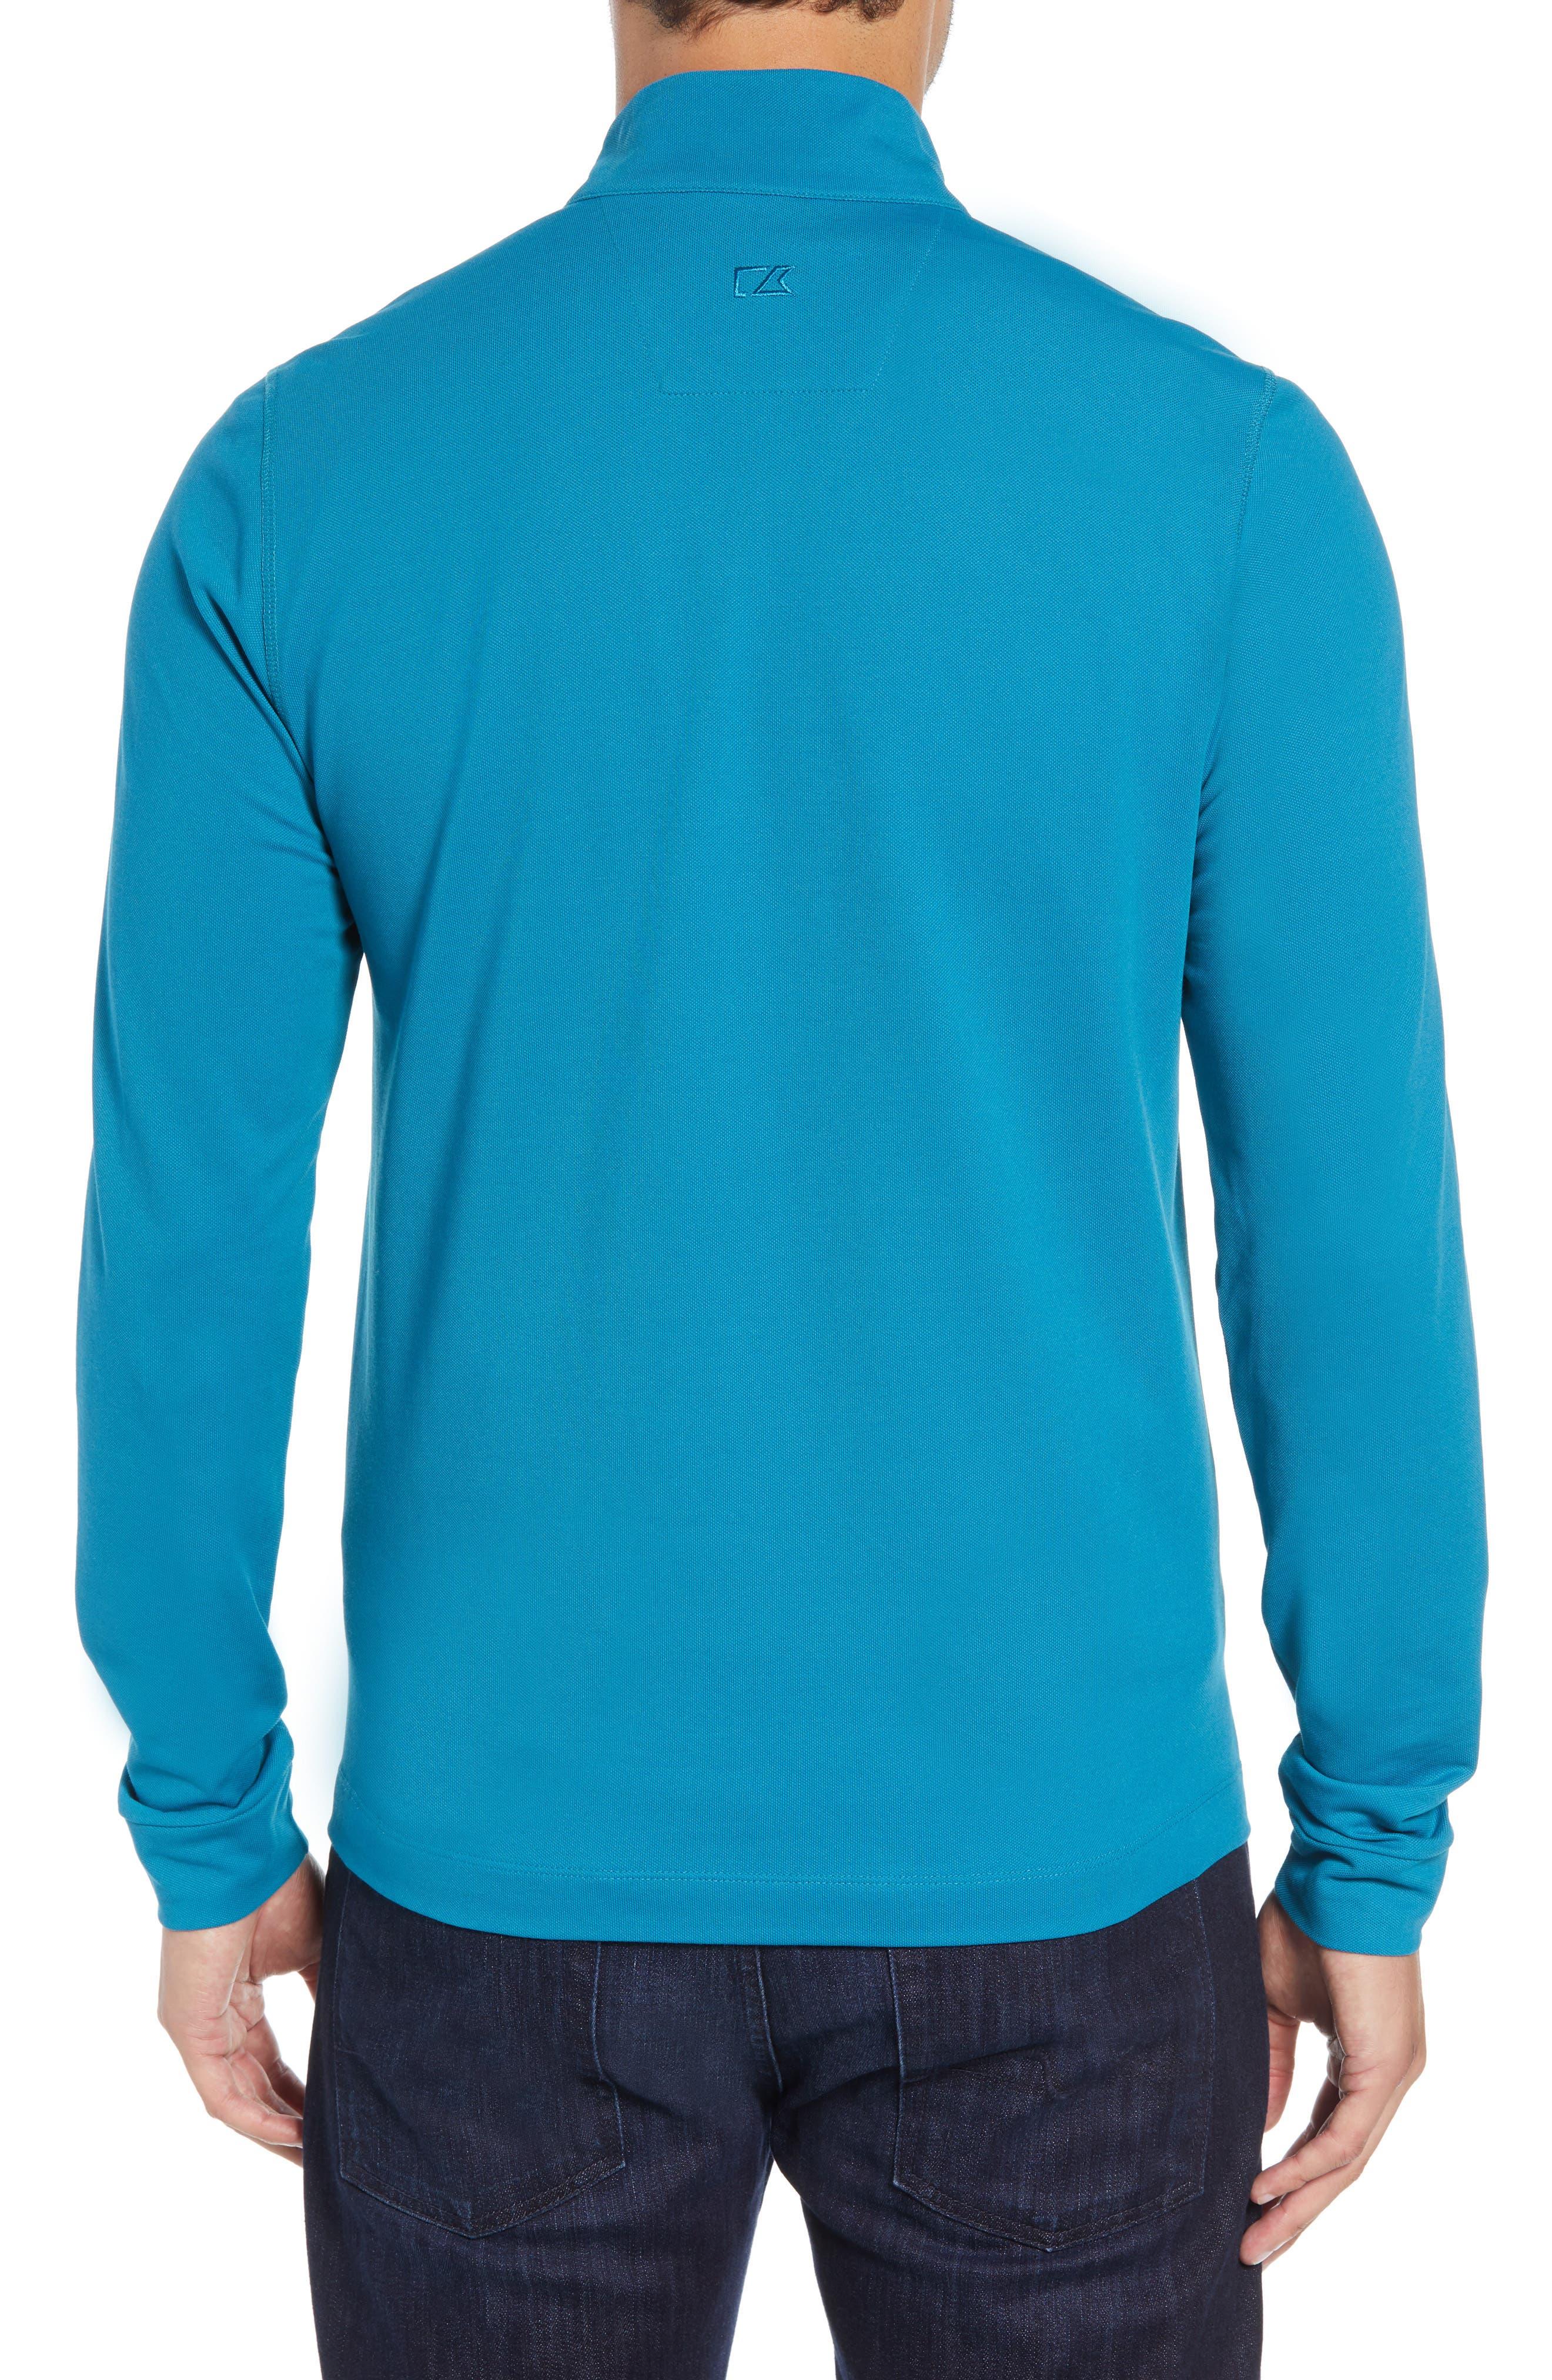 CUTTER & BUCK, Advantage Regular Fit DryTec Mock Neck Pullover, Alternate thumbnail 2, color, TEAL BLUE